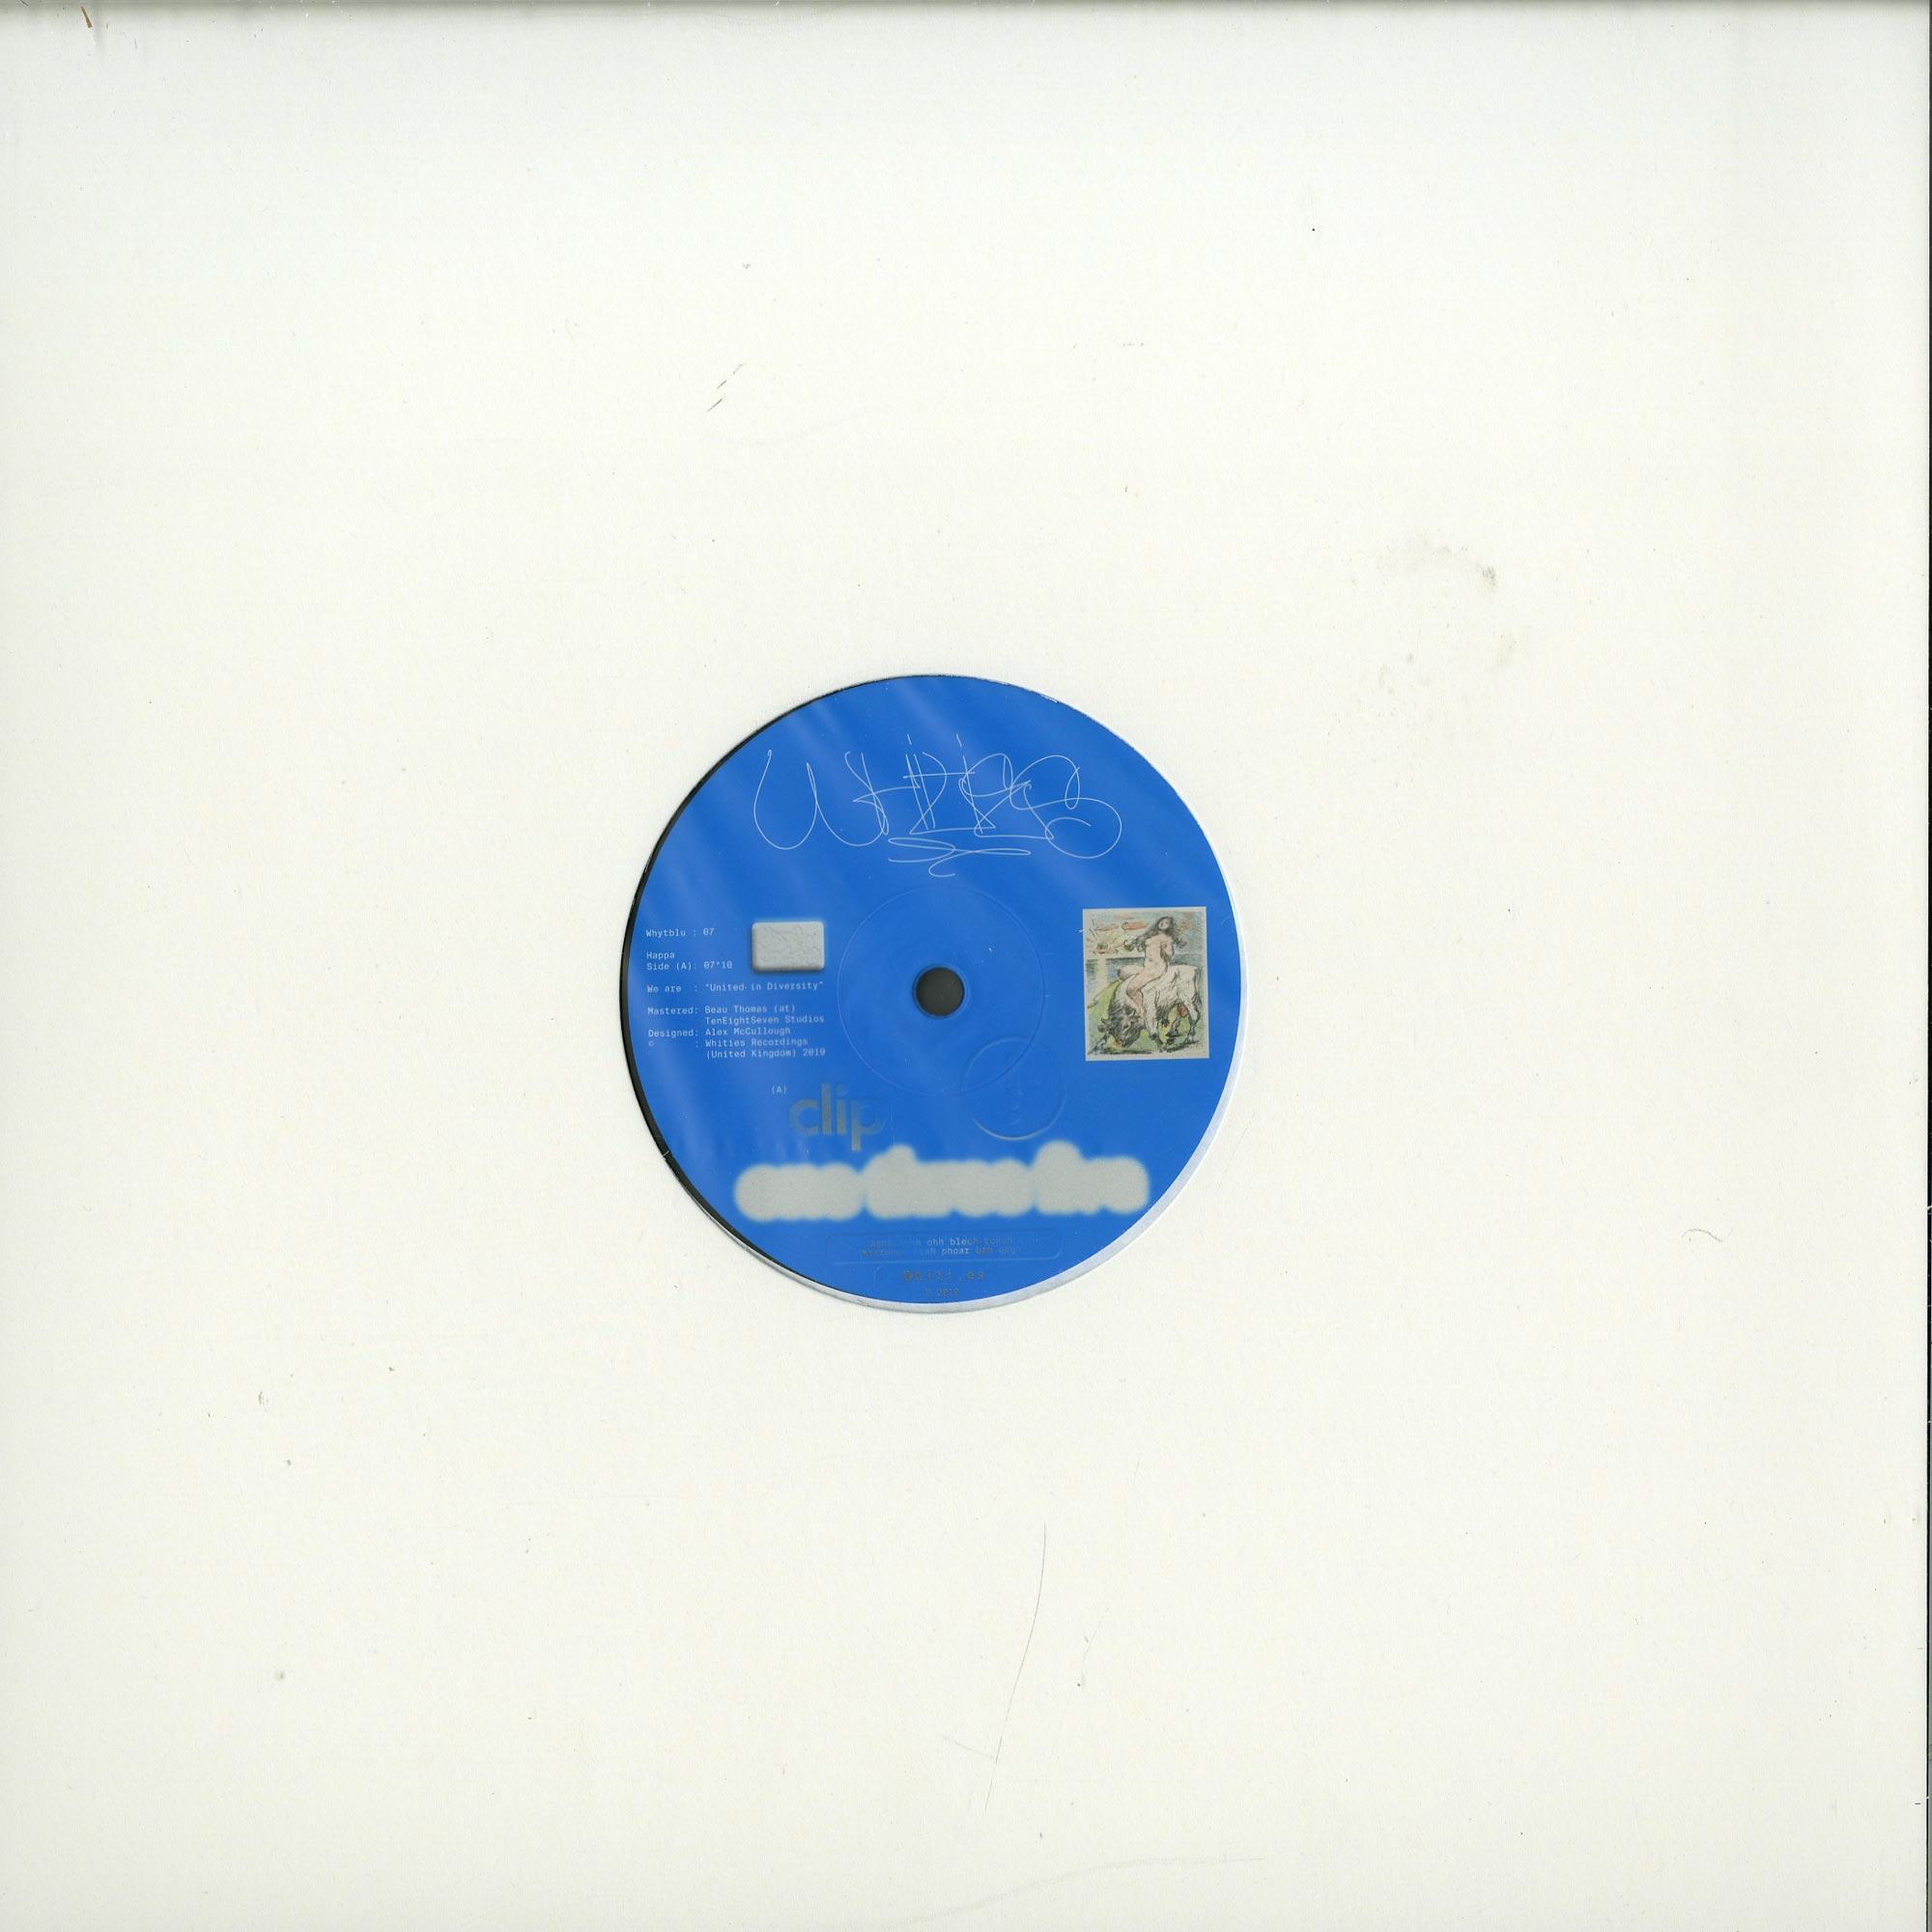 Happa - BLUE 07